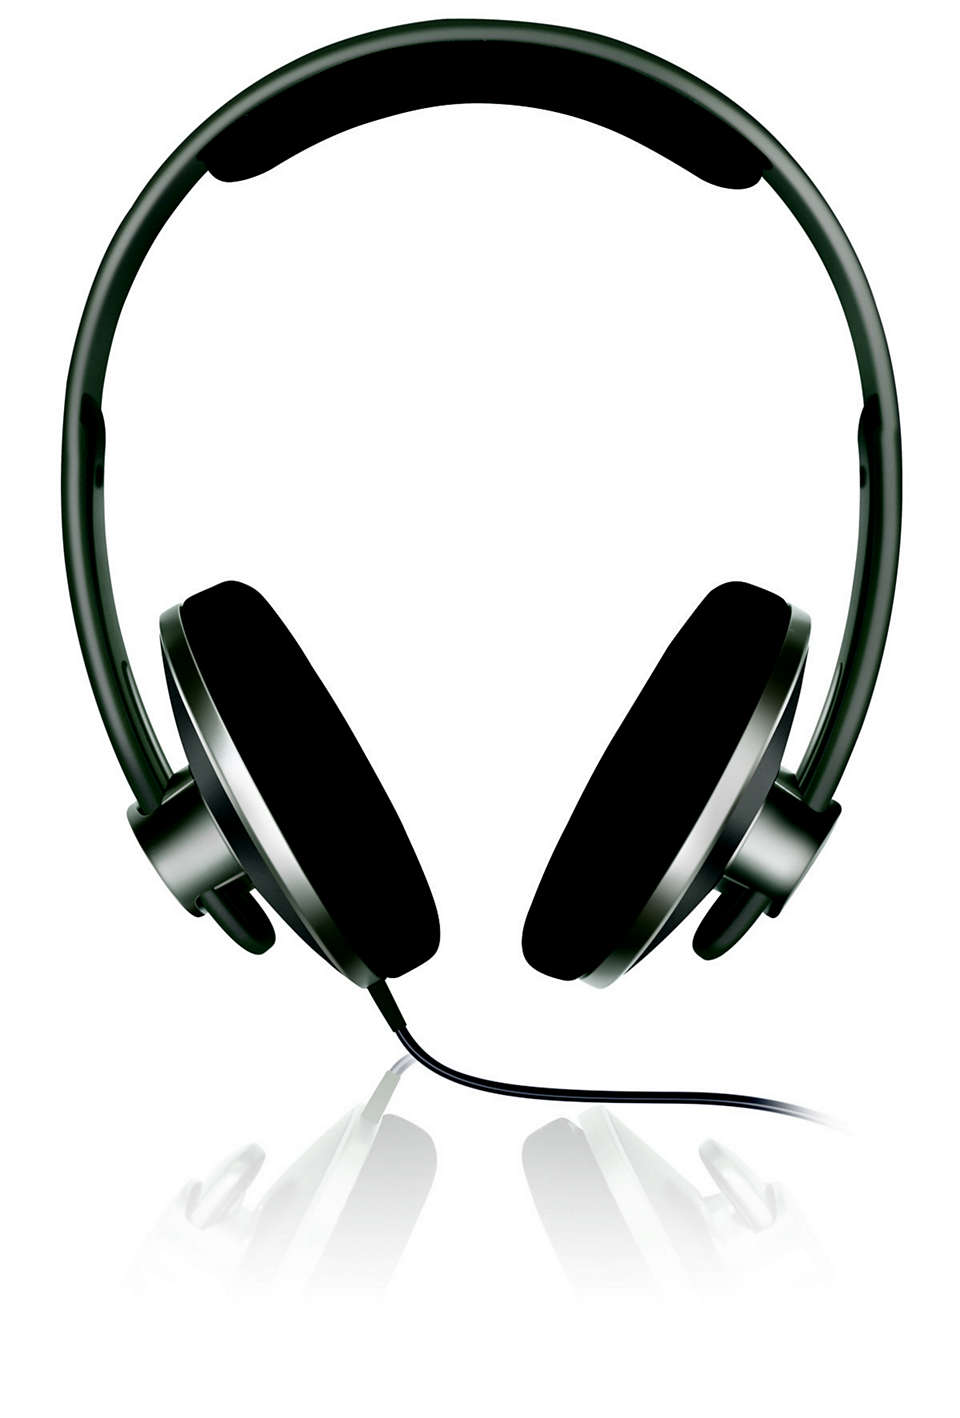 Powerful sound, portable design